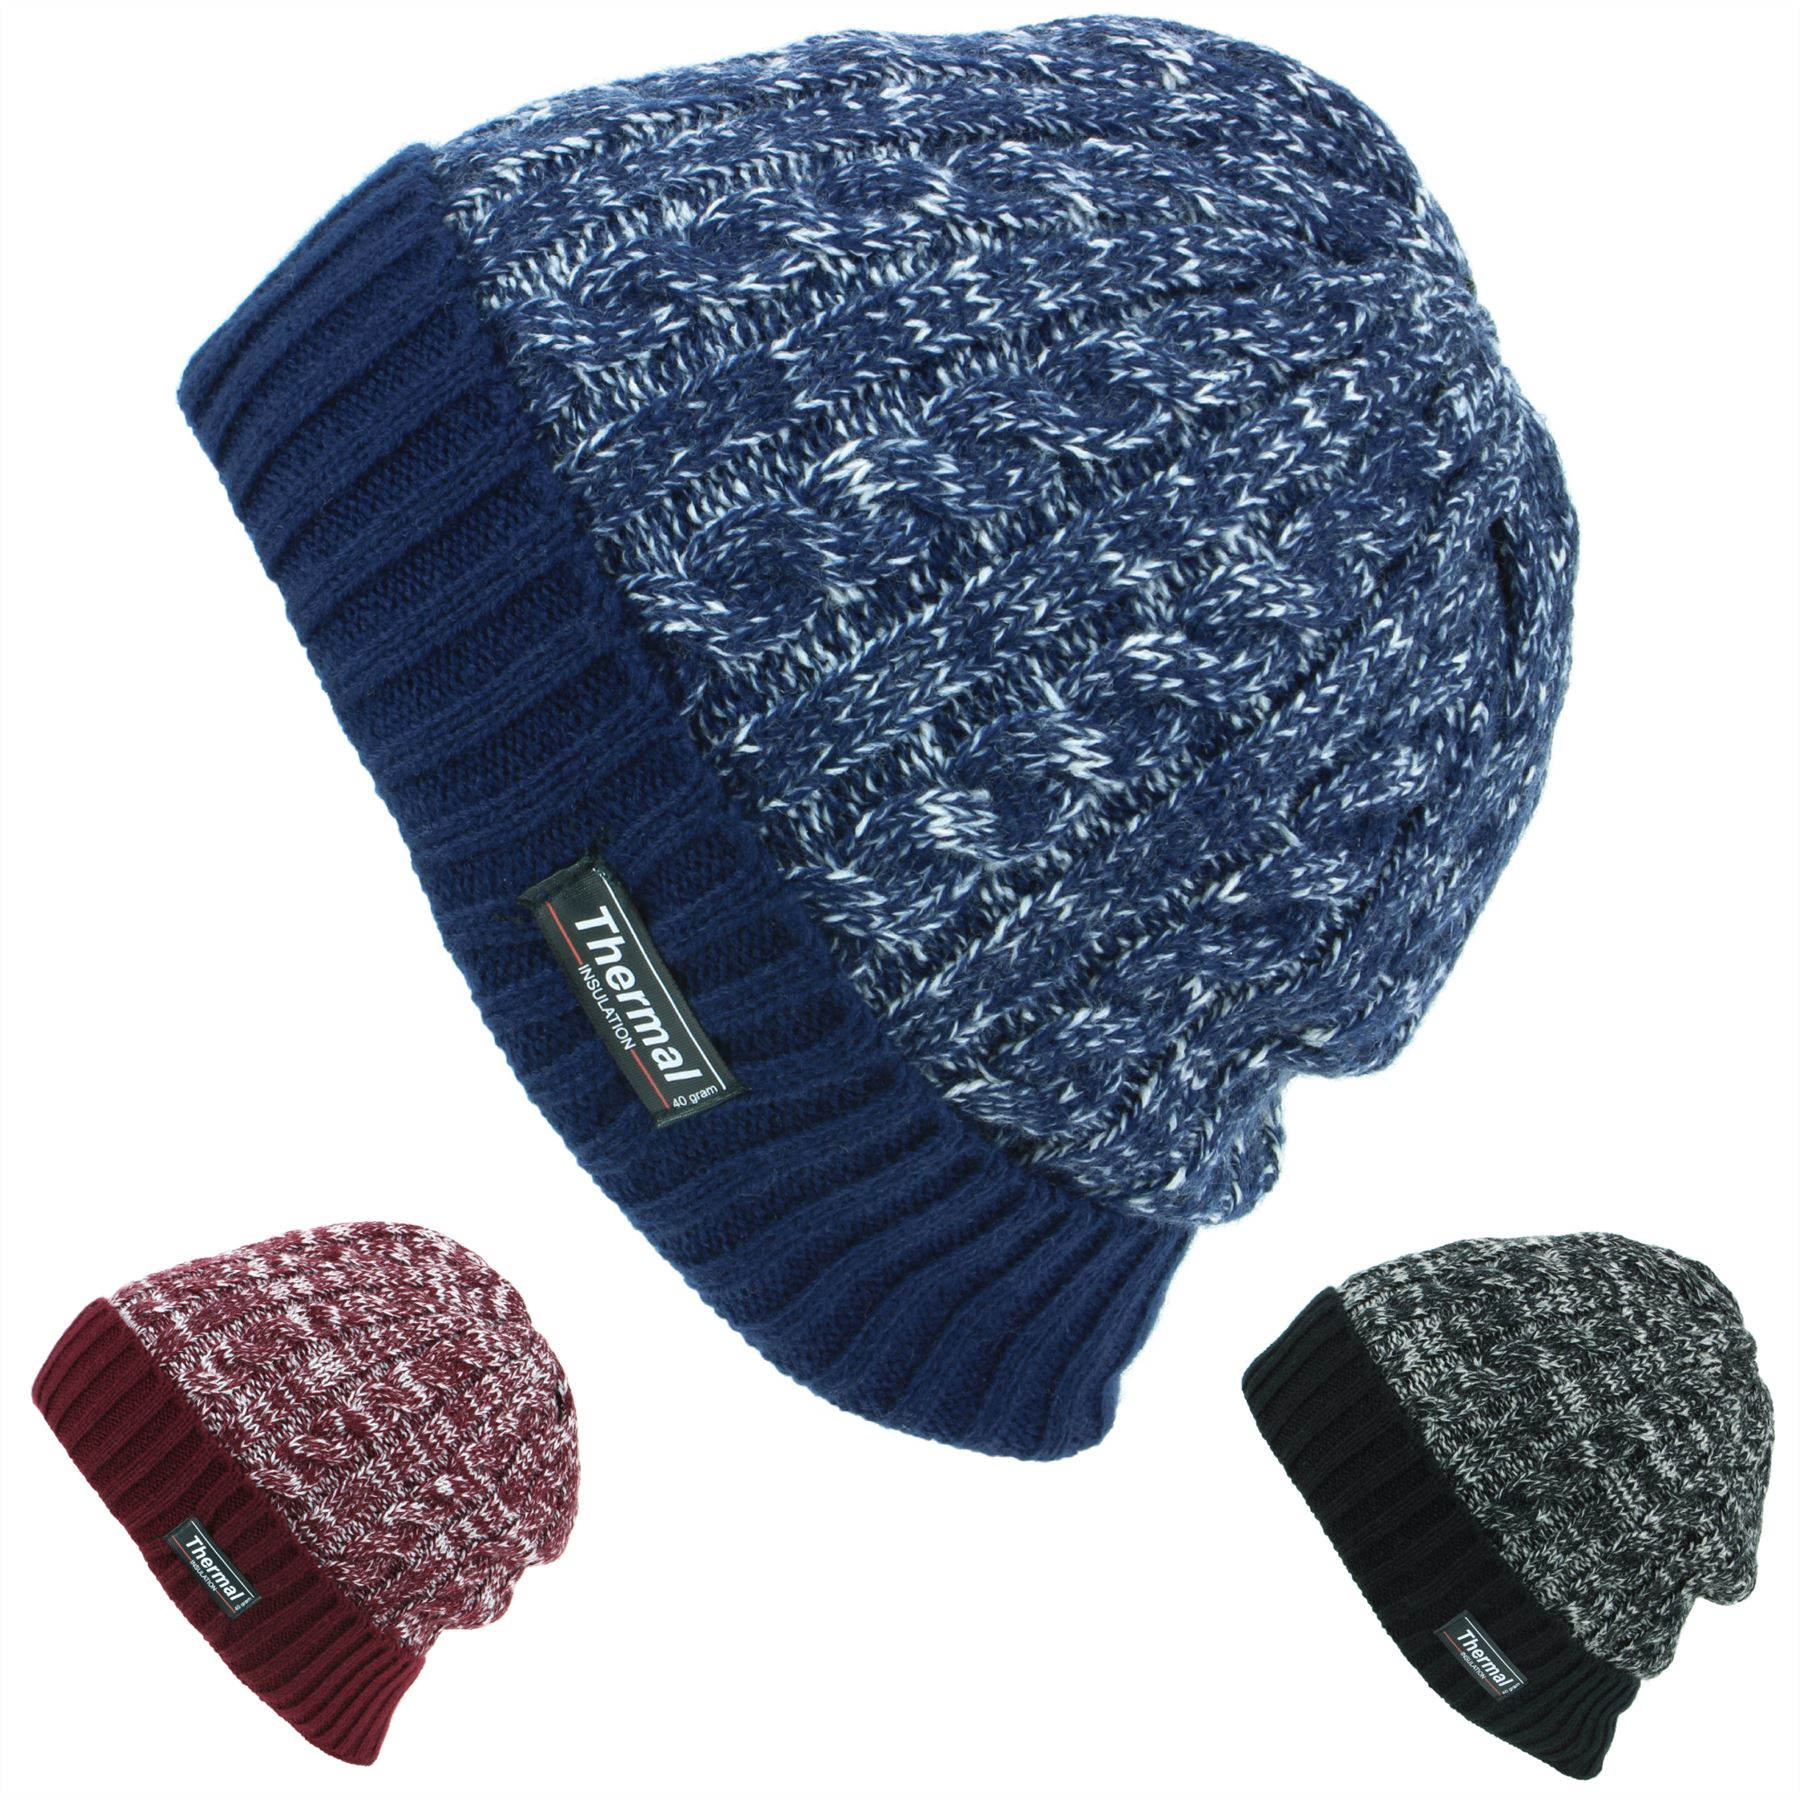 1cdfd8509ae1e Details about Beanie Hat Cap Warm Winter BLACK BLUE MAROON Thinsulate 3M  Men Ladies Knit Ski